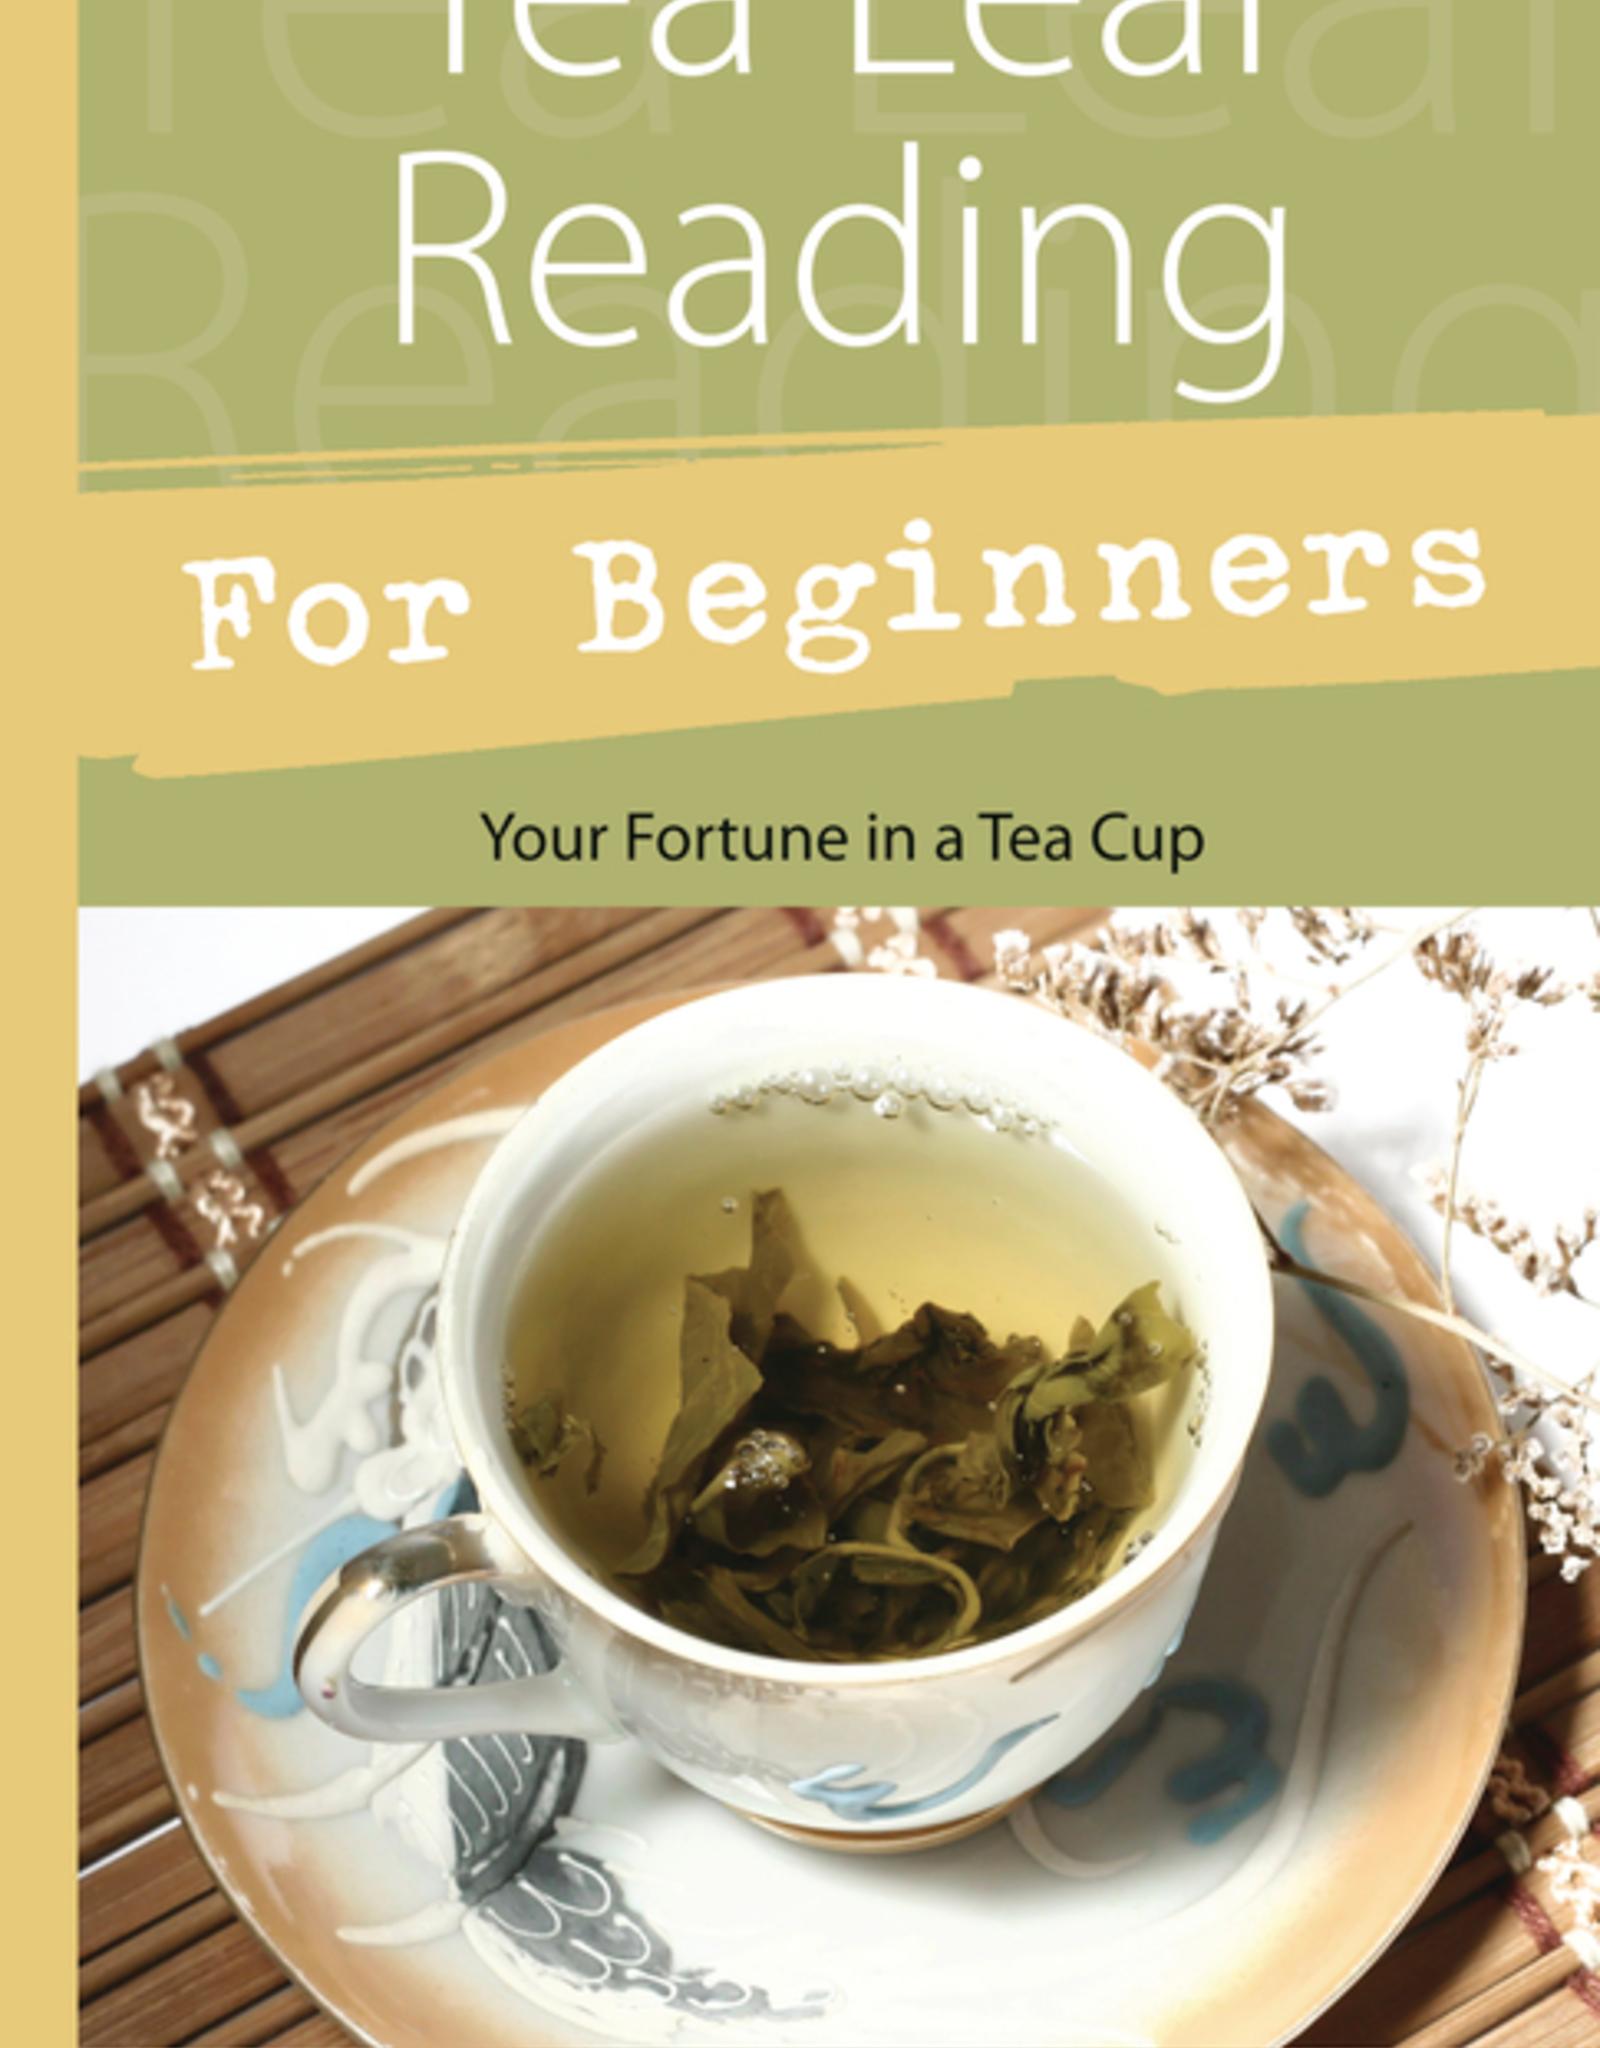 Llewelyn Tea Leaf Reading for Beginners